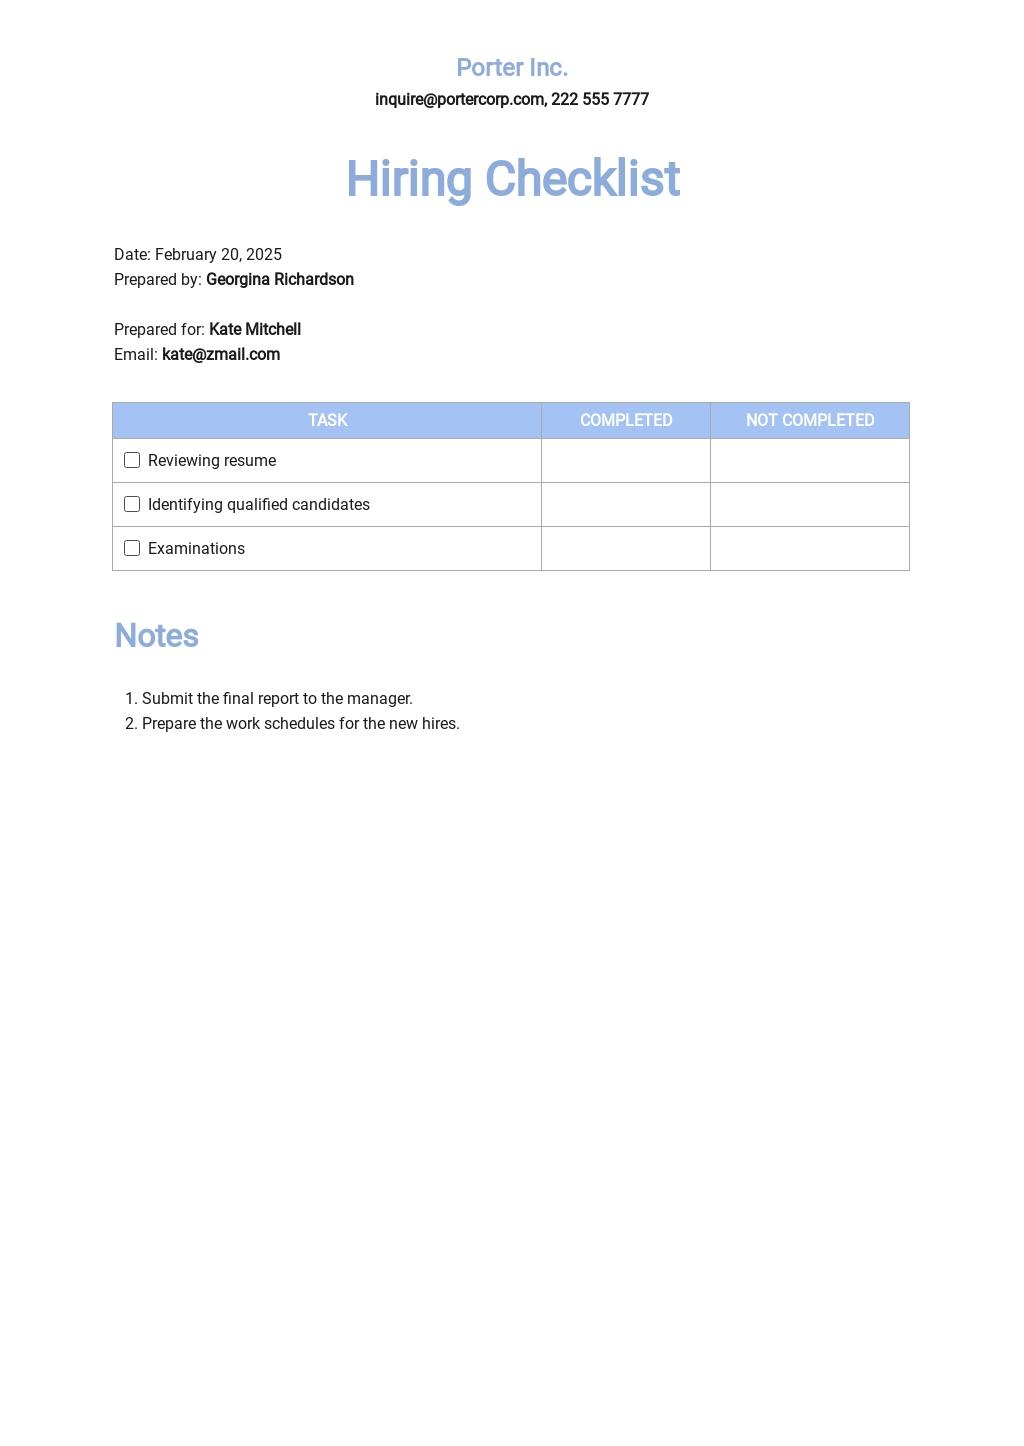 14+ FREE Hiring Checklist Templates [Edit & Download